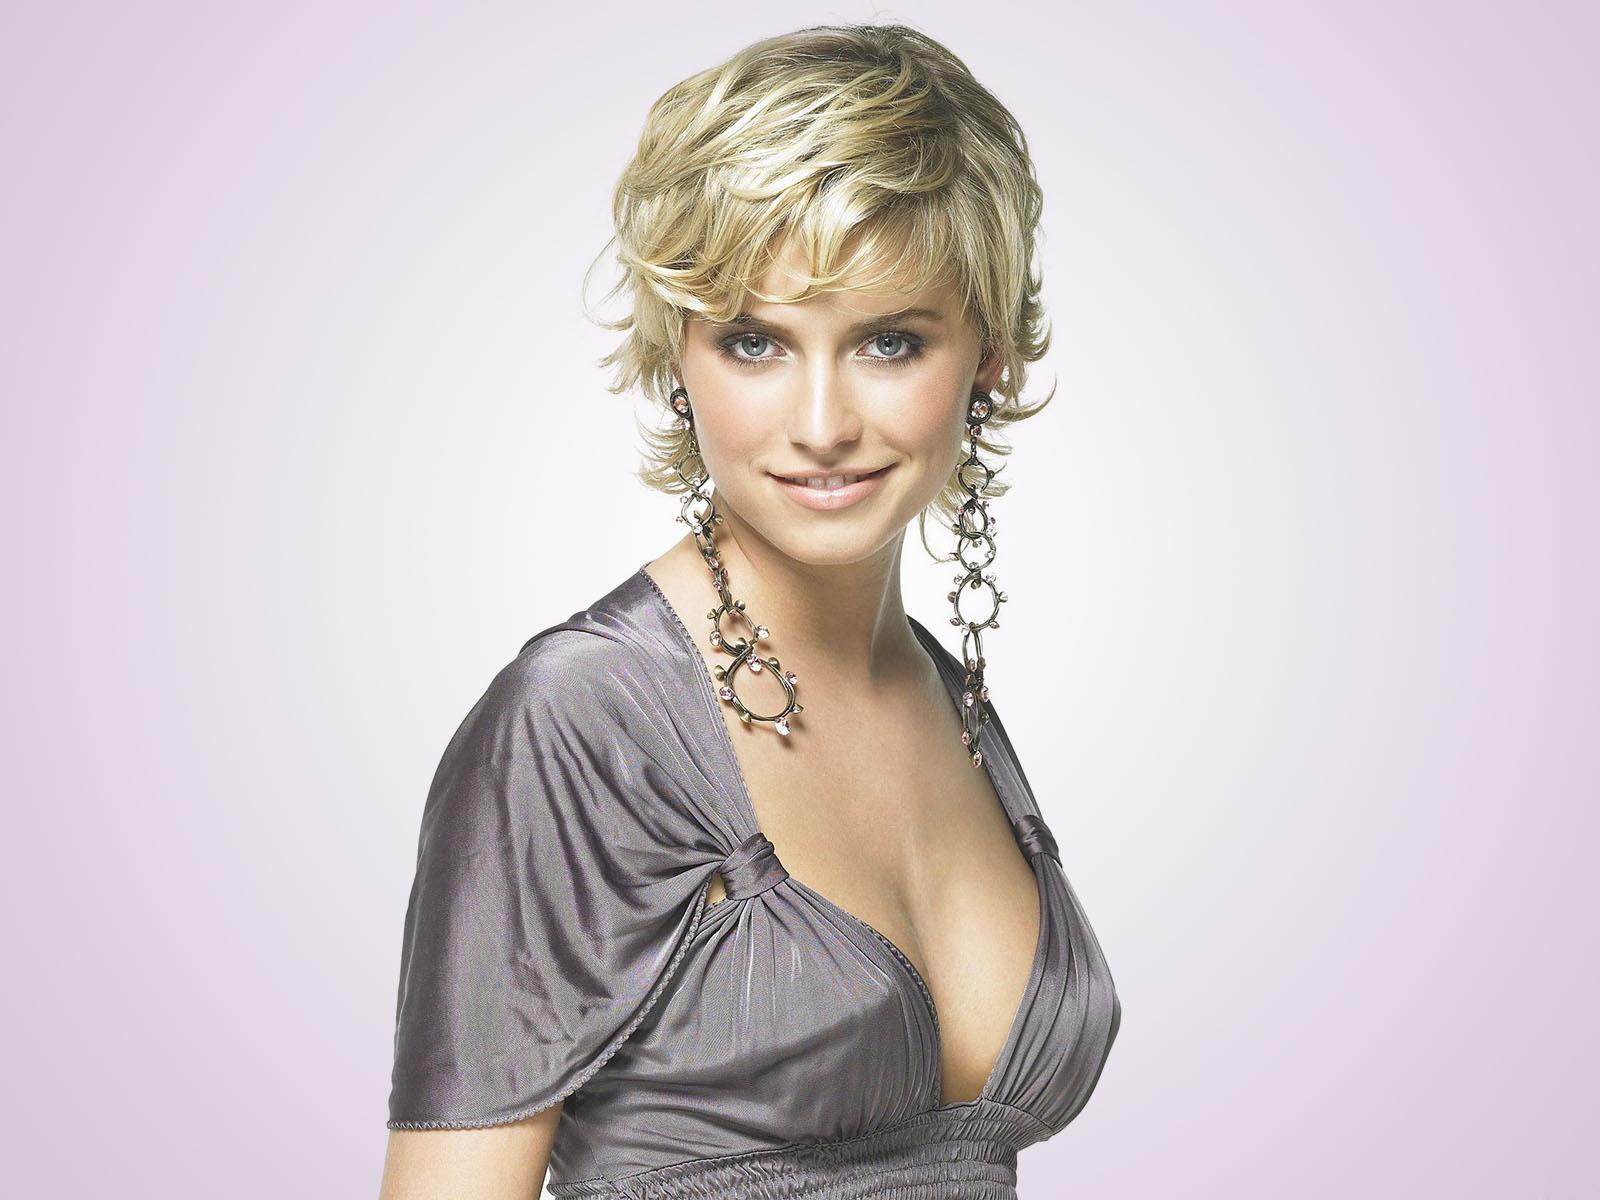 All Model and Movie Stars Photo Gallery: Lena Gercke